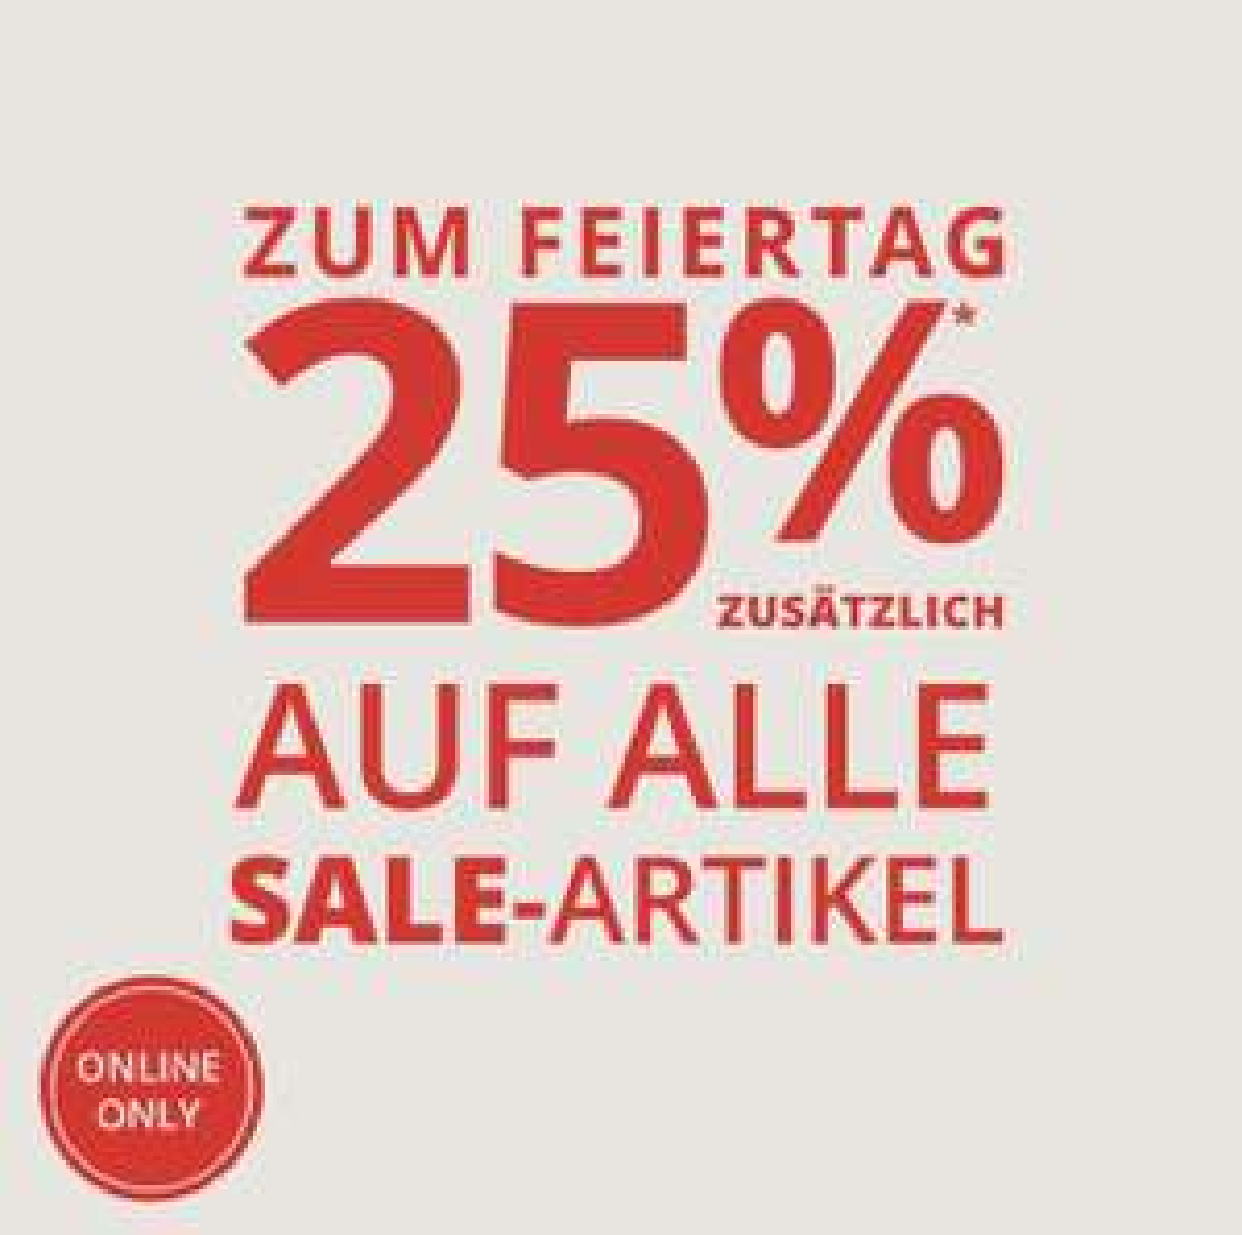 Peek & Cloppenburg: 25% Extra-Rabatt auf Sale-Artikel